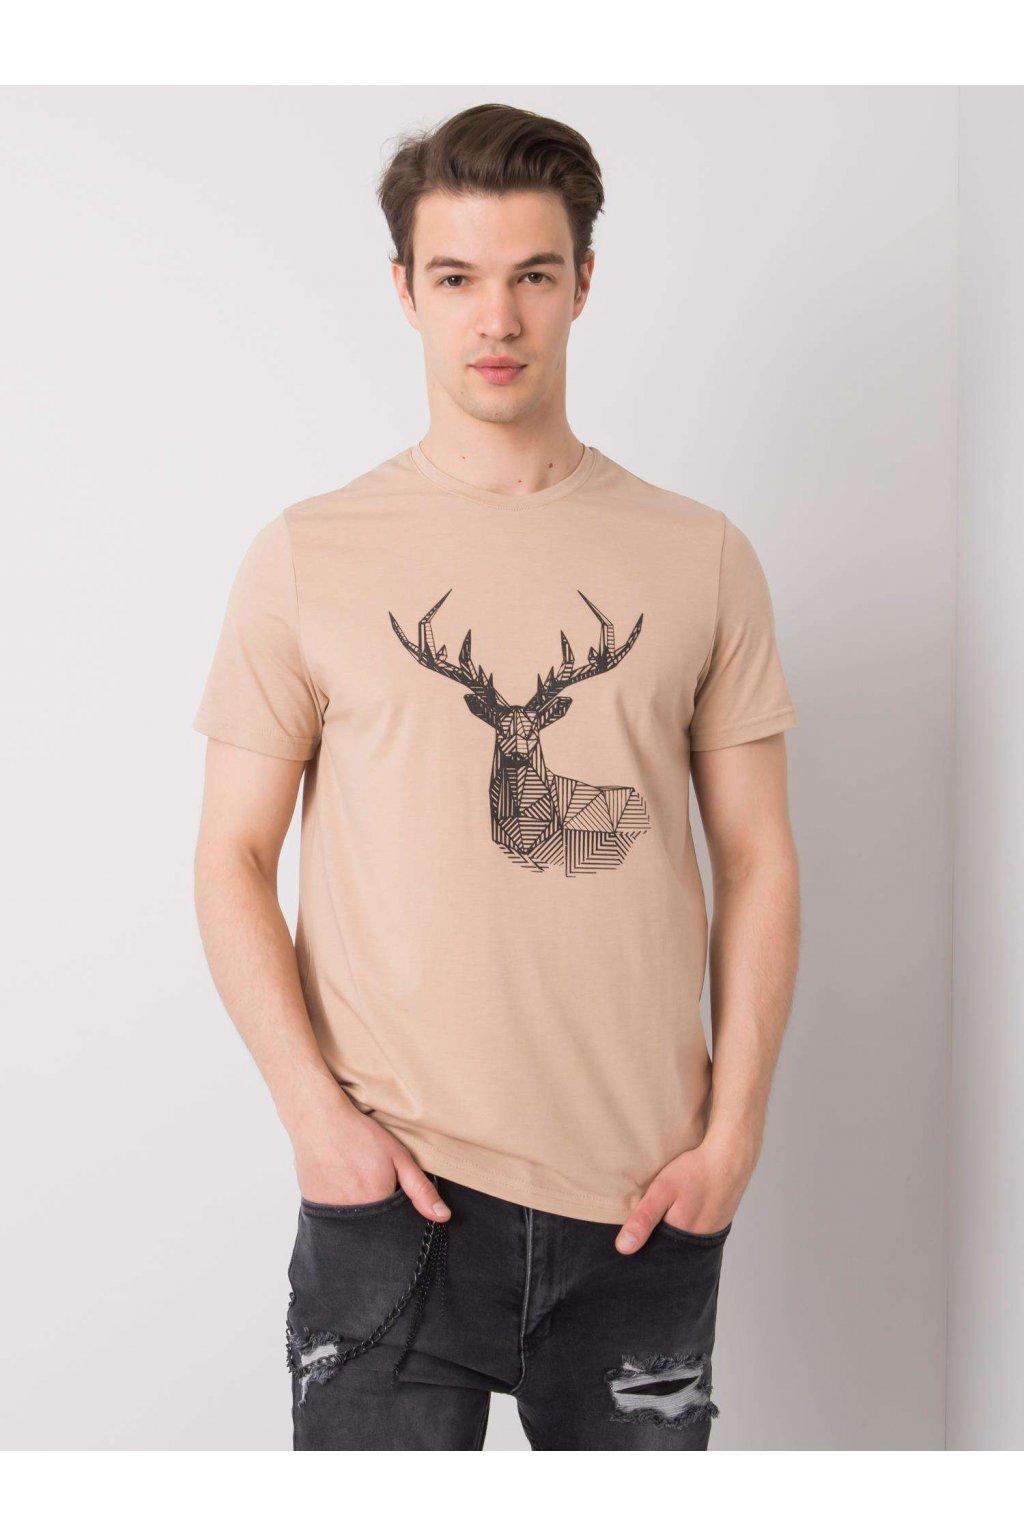 Pánske tričko t-shirt kód TSKK-Y21-0000149